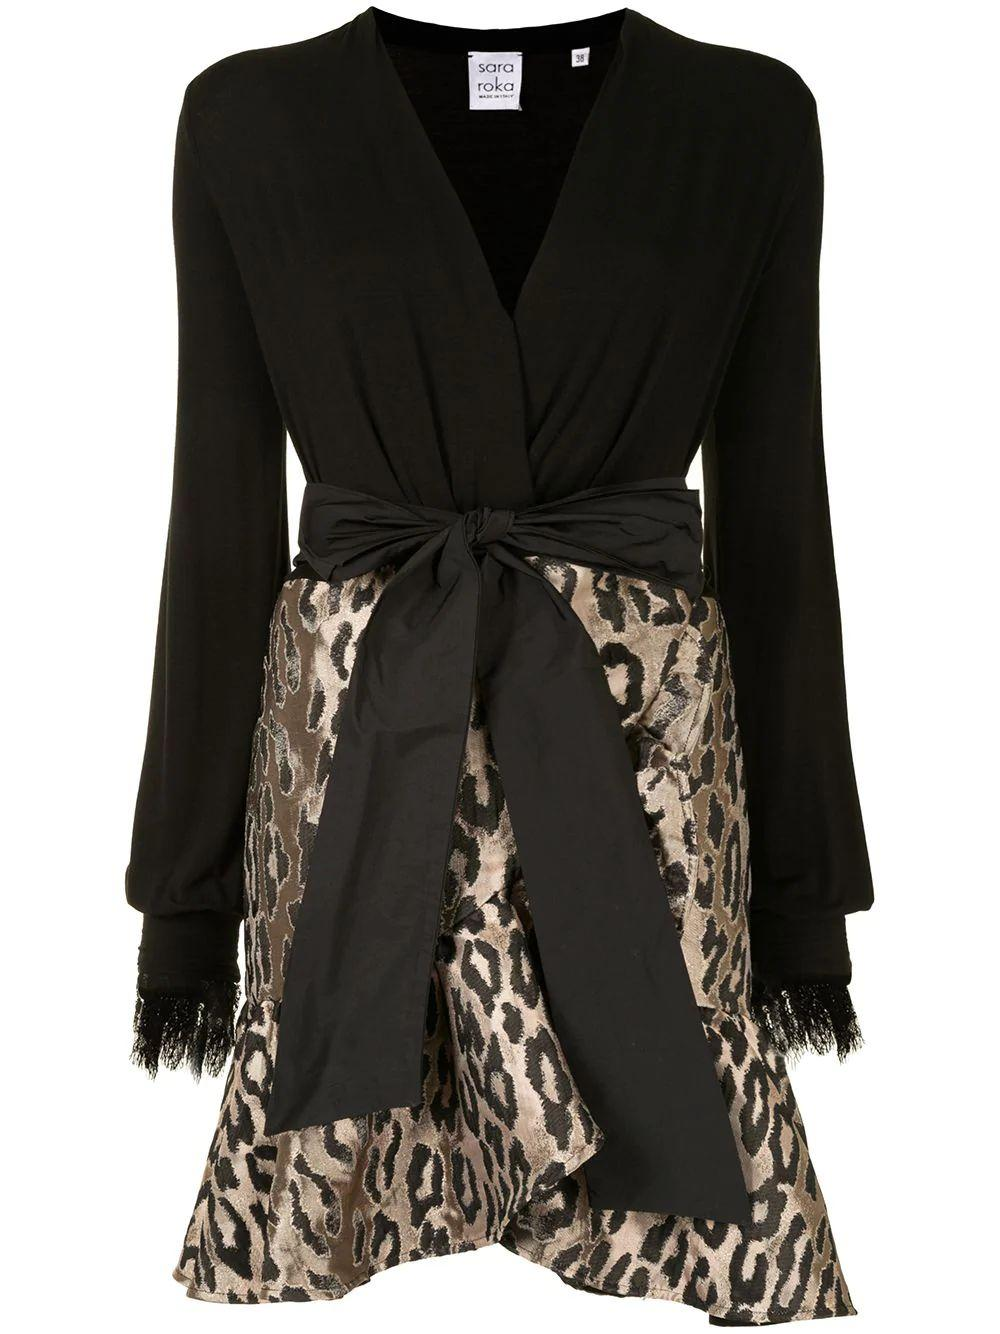 Leopard Print Dress With Lace Accents Item # 9JANKA50